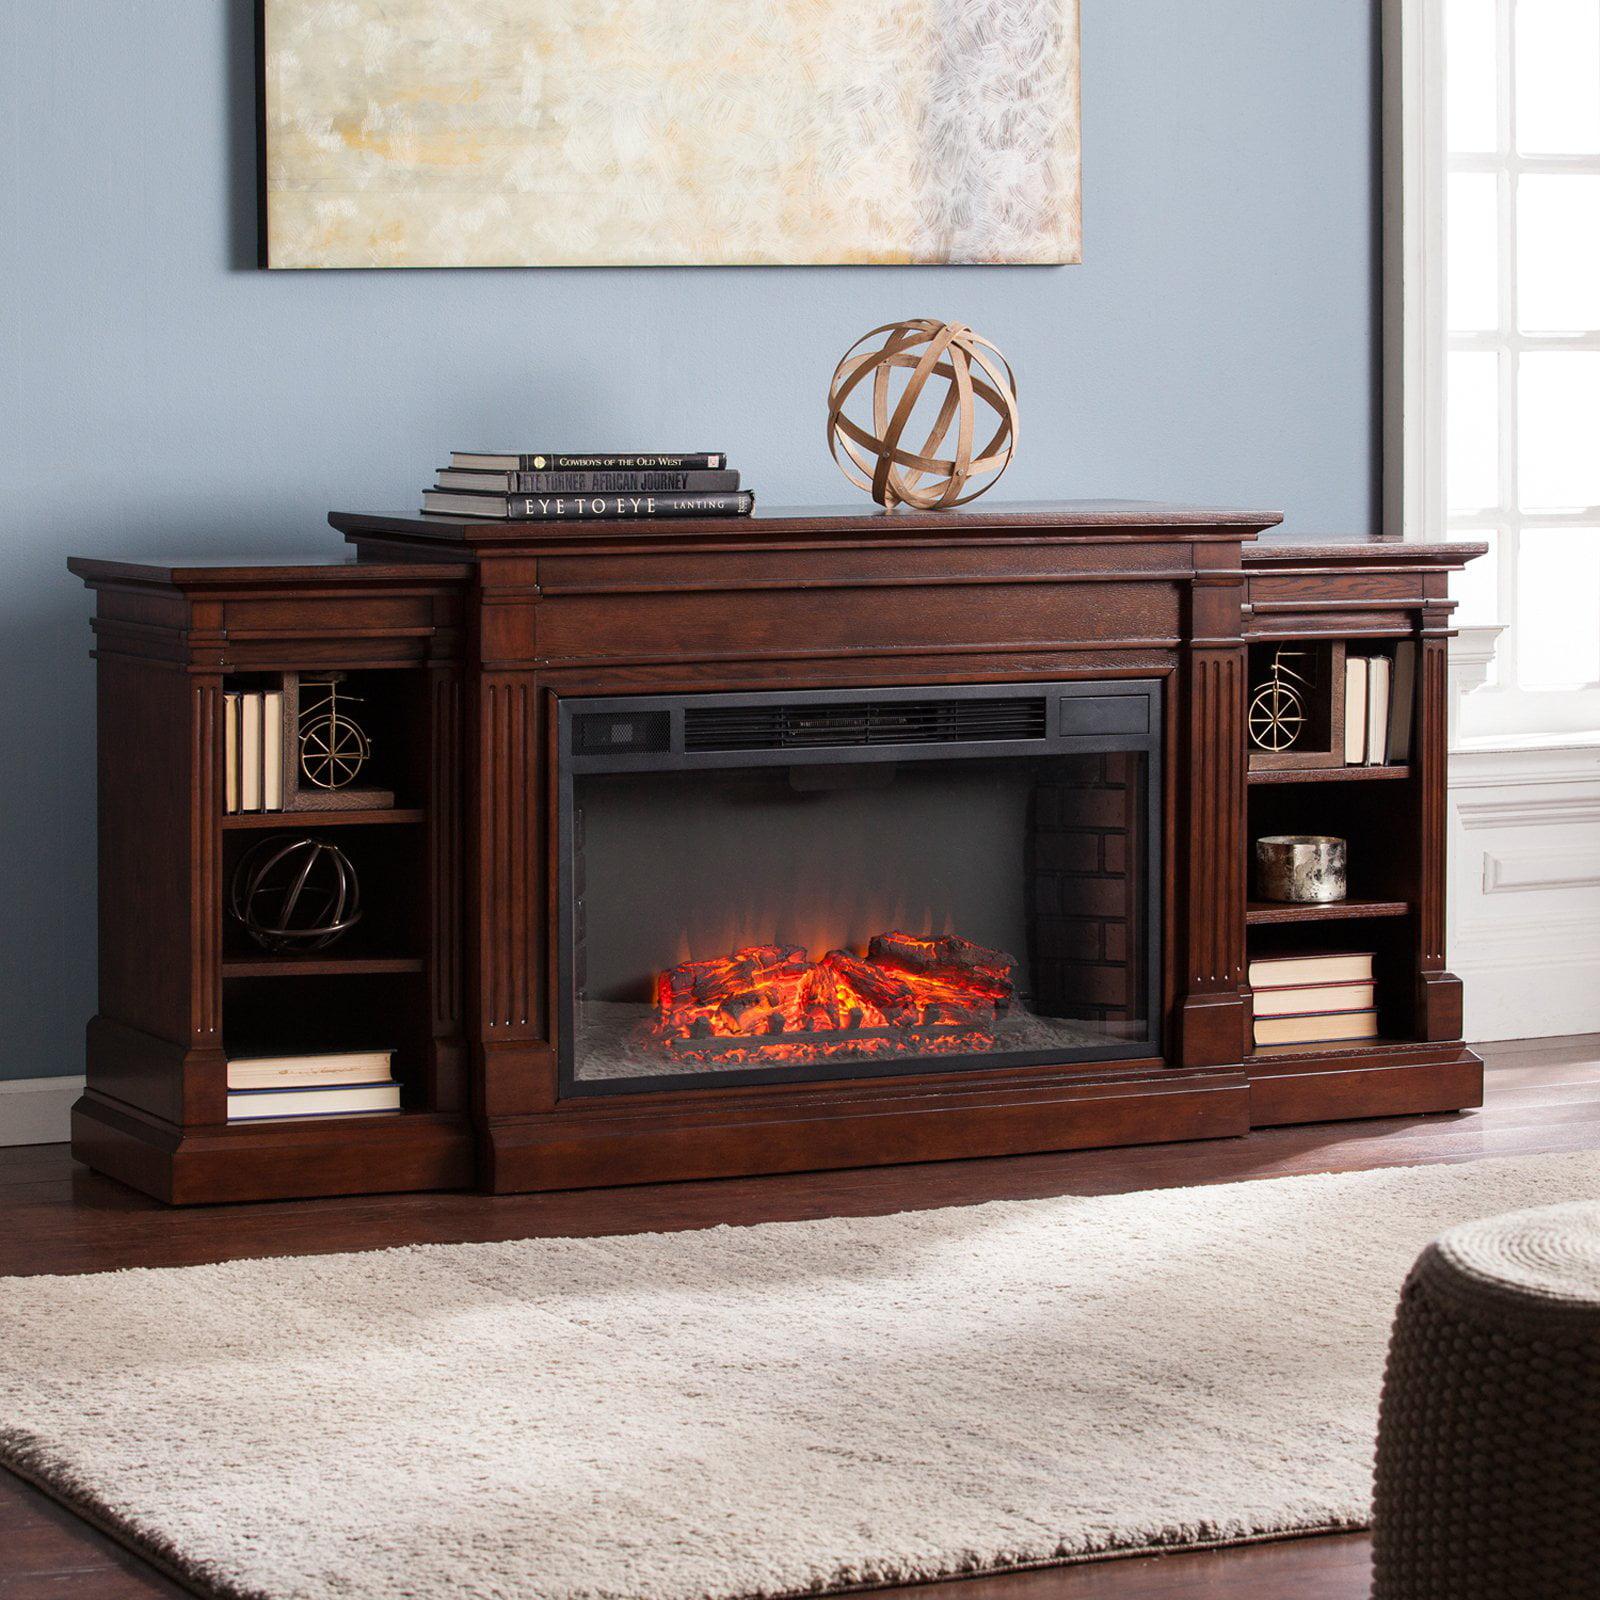 Southern Enterprises Reese Widescreen Electric Fireplace with Bookcase by Southern Enterprises